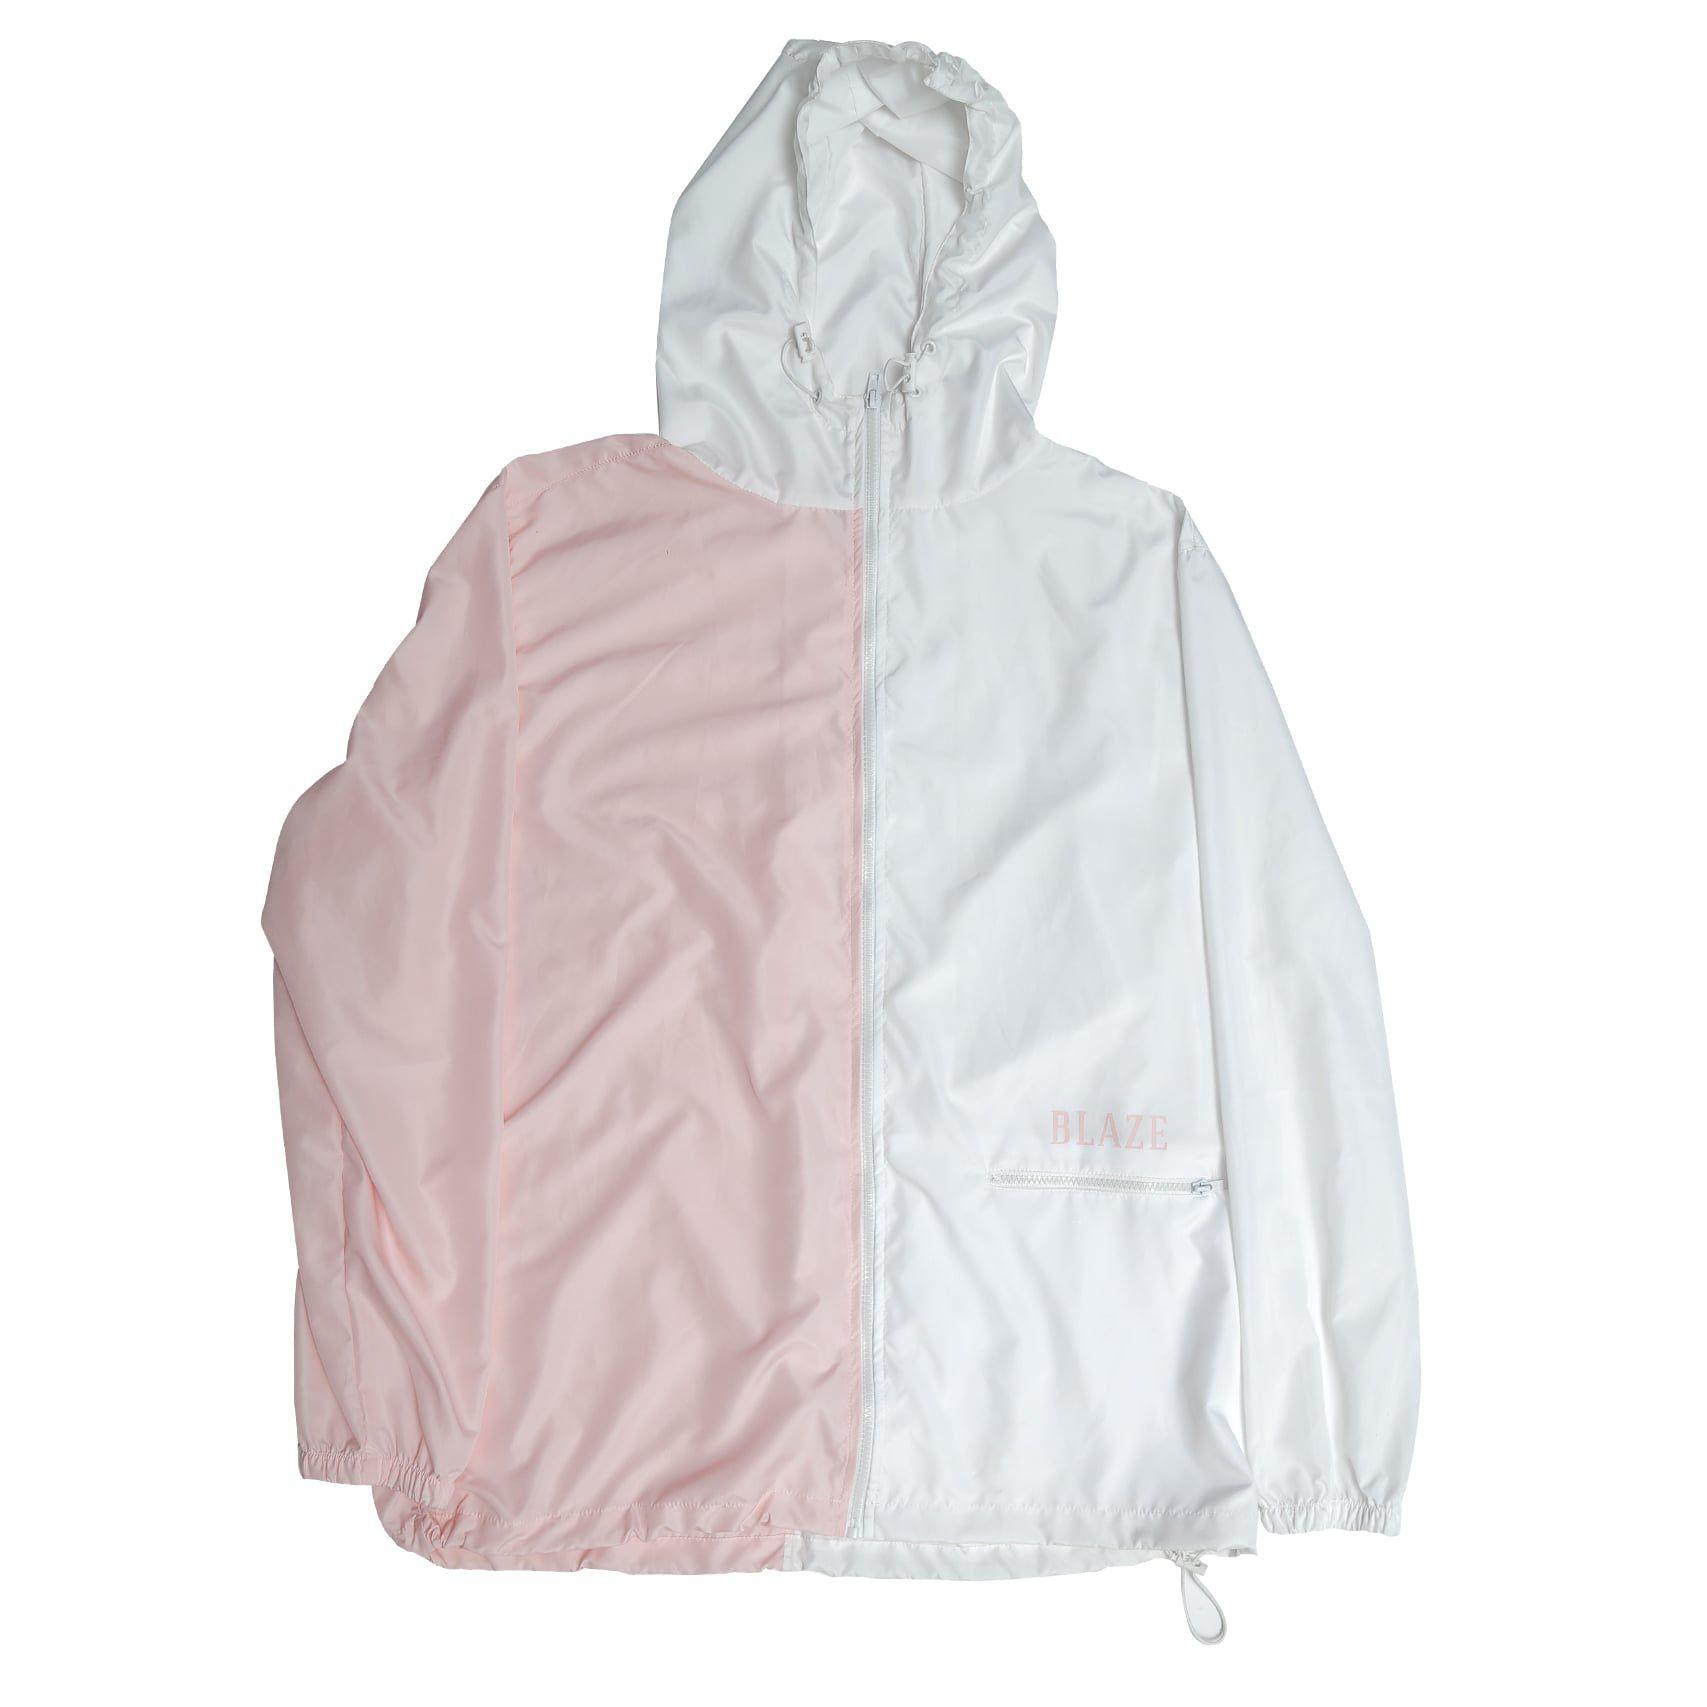 Jaqueta Corta Vento Blaze Bi Color Skin Rosa/Branco